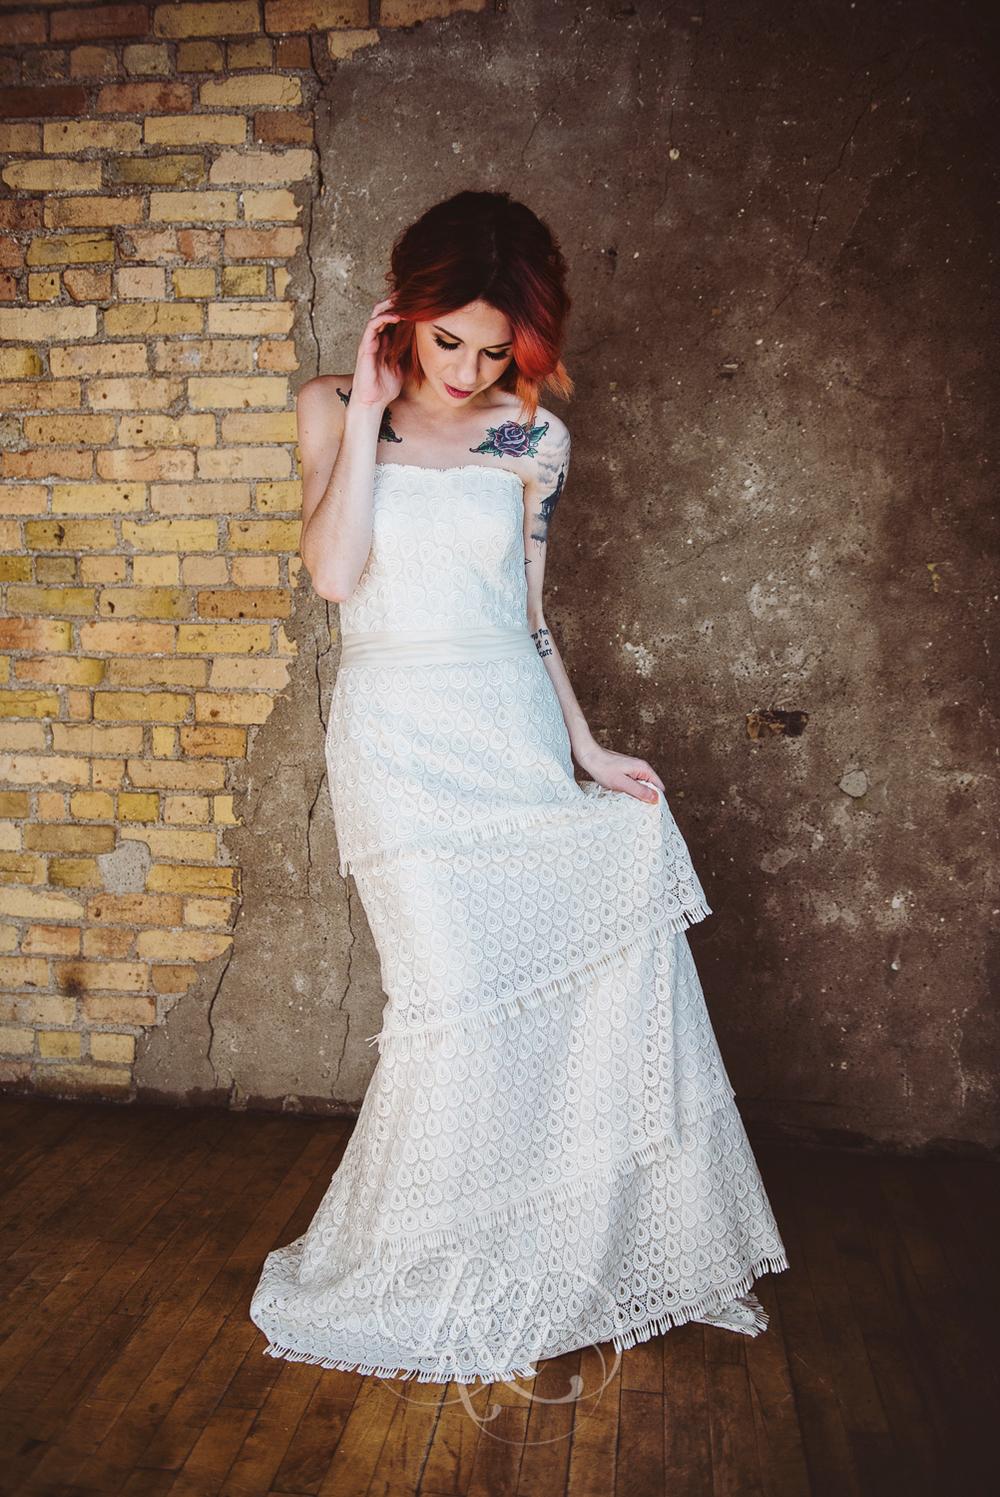 Minneapolis Wedding Shoot - RKH Images - Minnesota Wedding Photographer - Samples-8